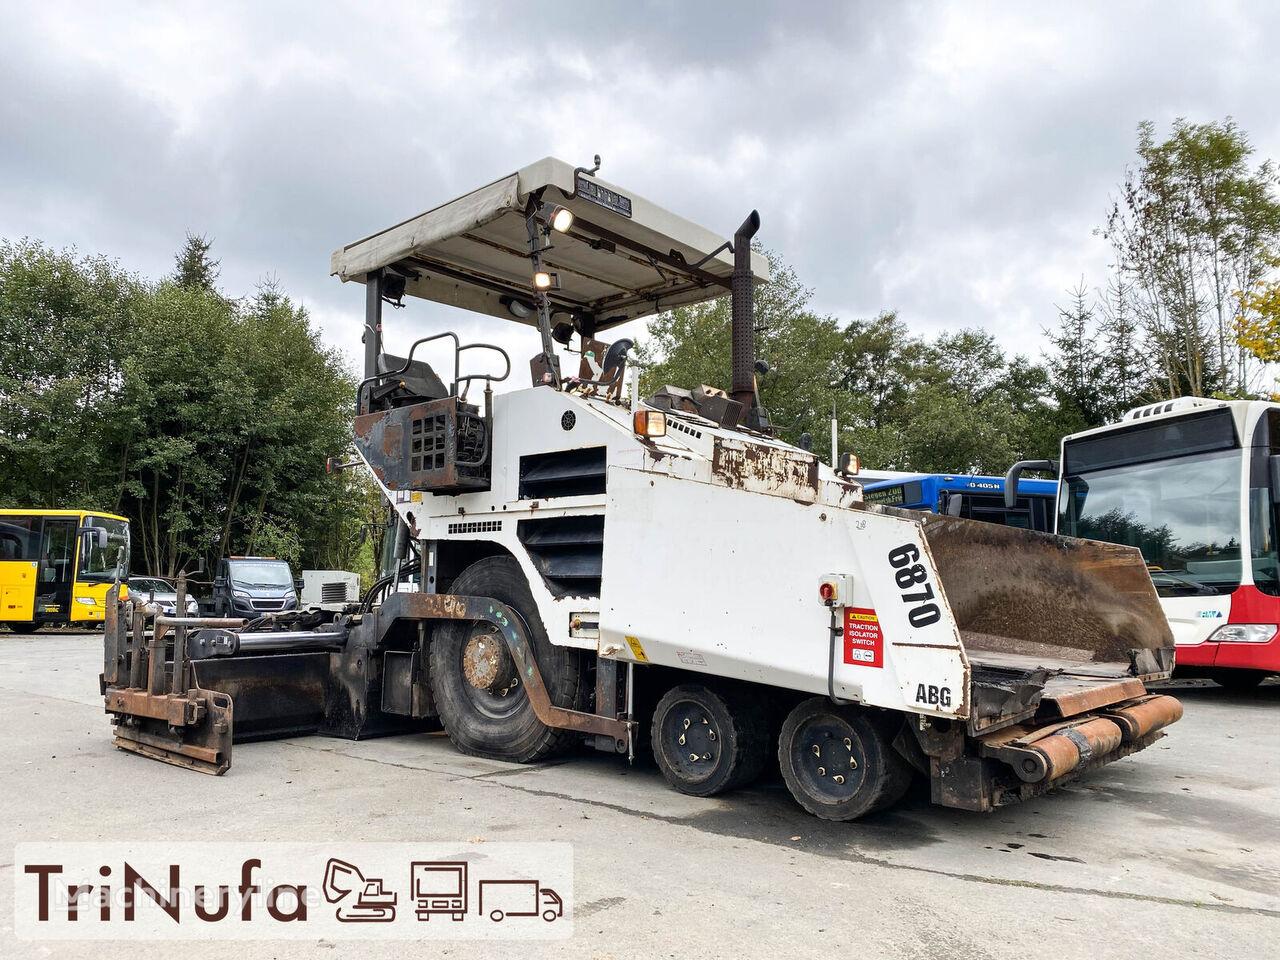 VOLVO 6870 ABG   Fertigungsbreite 5,3m    wheel asphalt paver